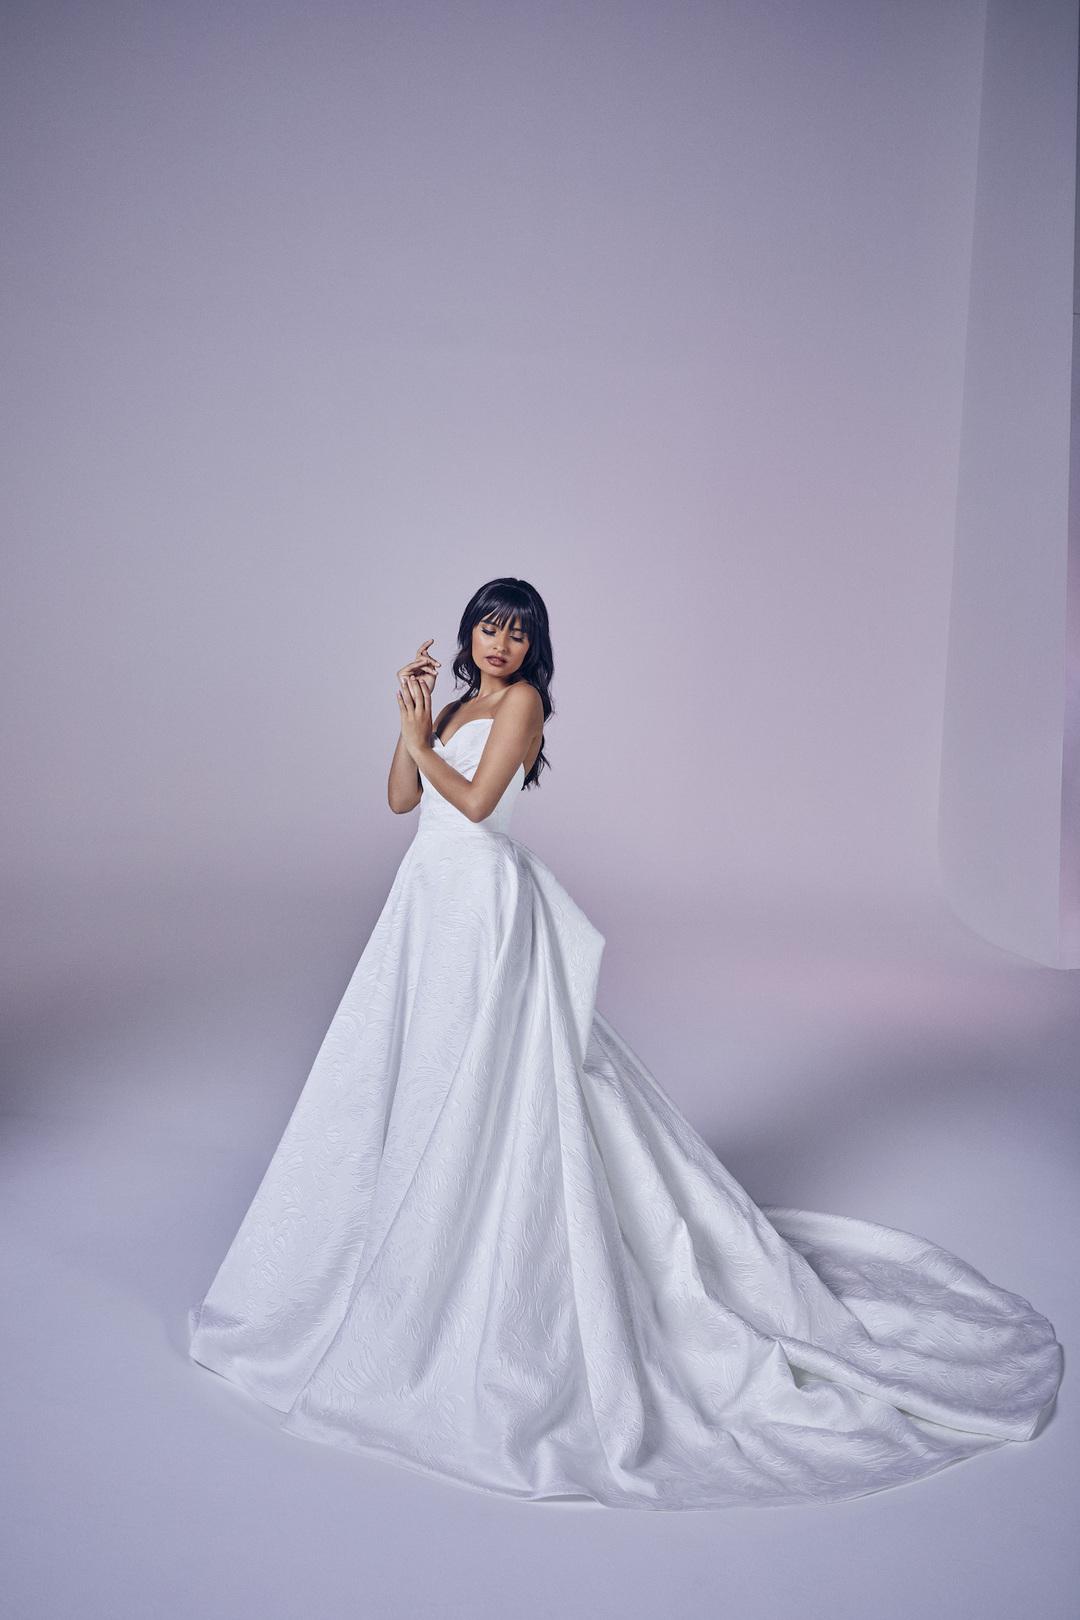 operetta dress photo